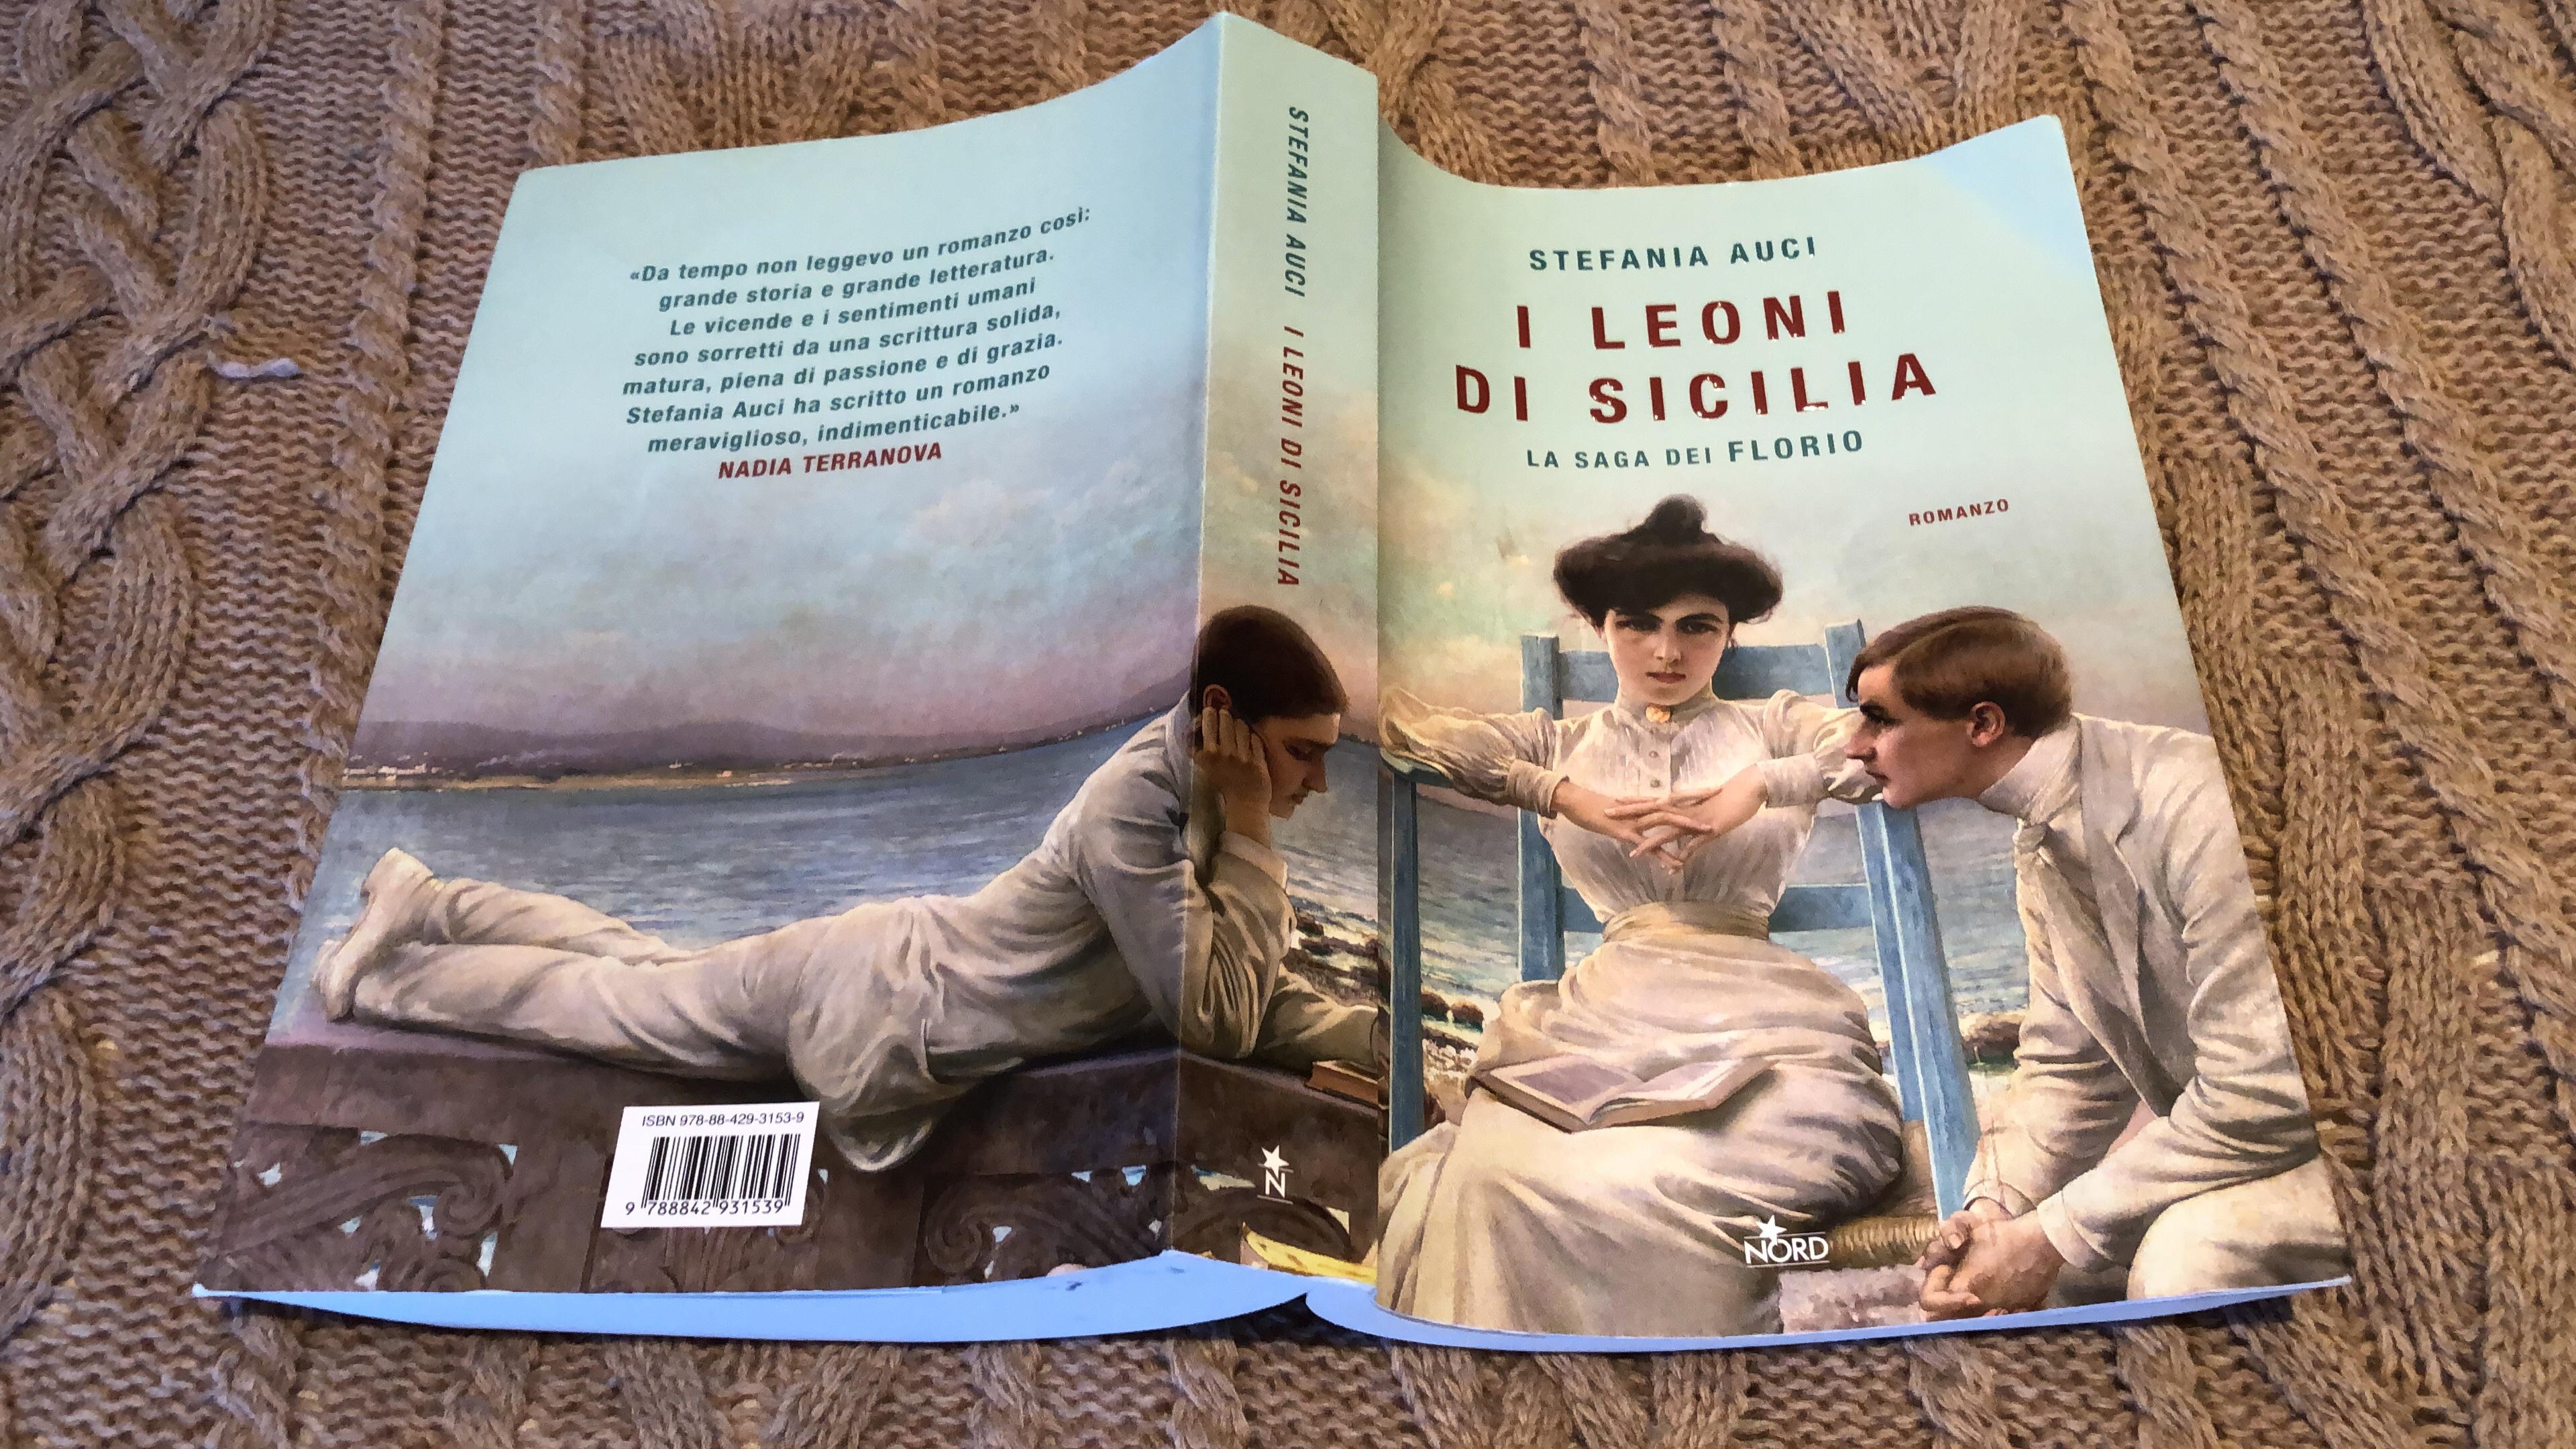 Fabulous new novel by Stefania Auci - brilliant